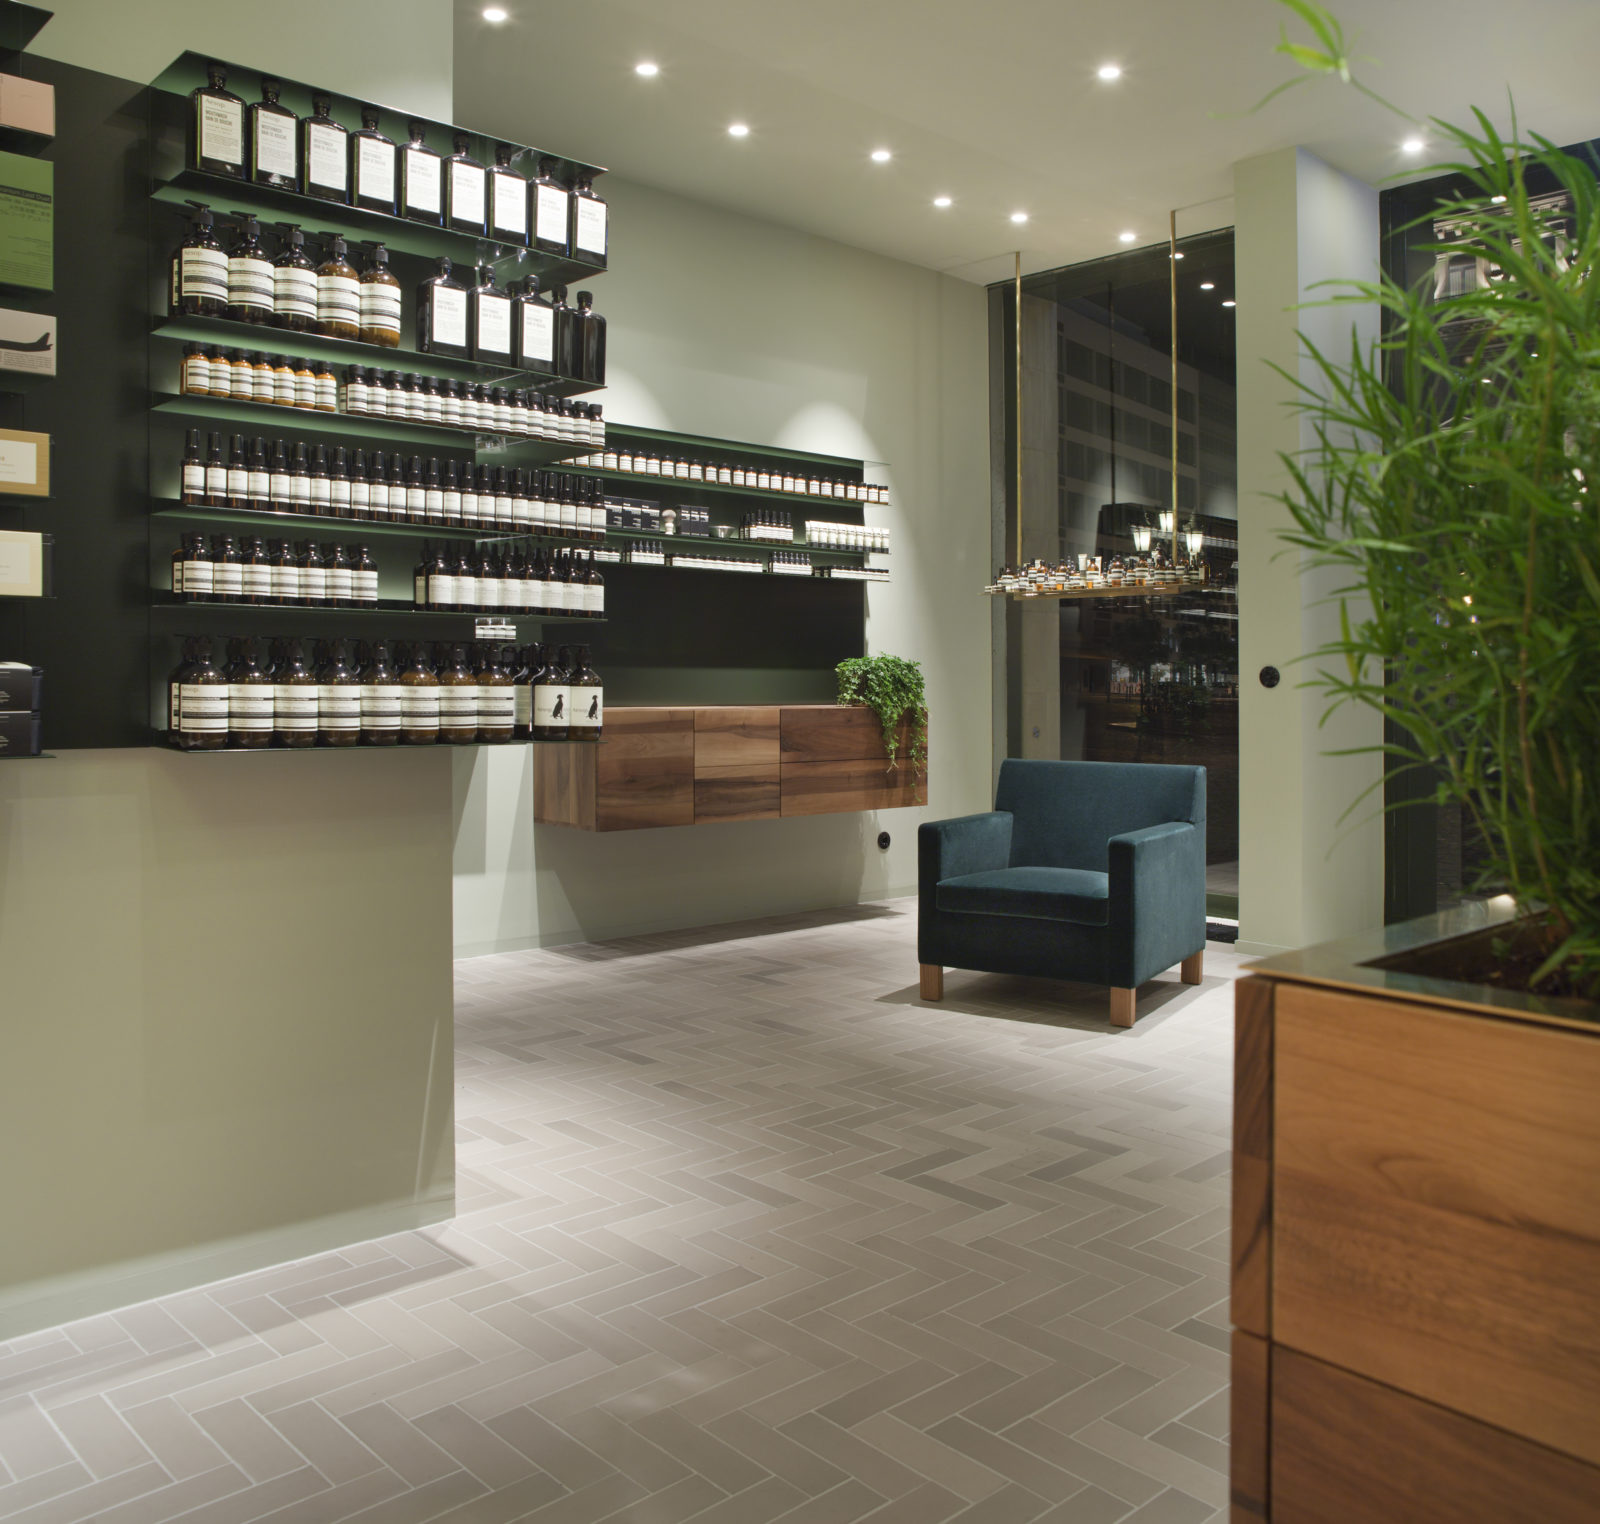 aesop frankfurt am main philipp mainzer. Black Bedroom Furniture Sets. Home Design Ideas